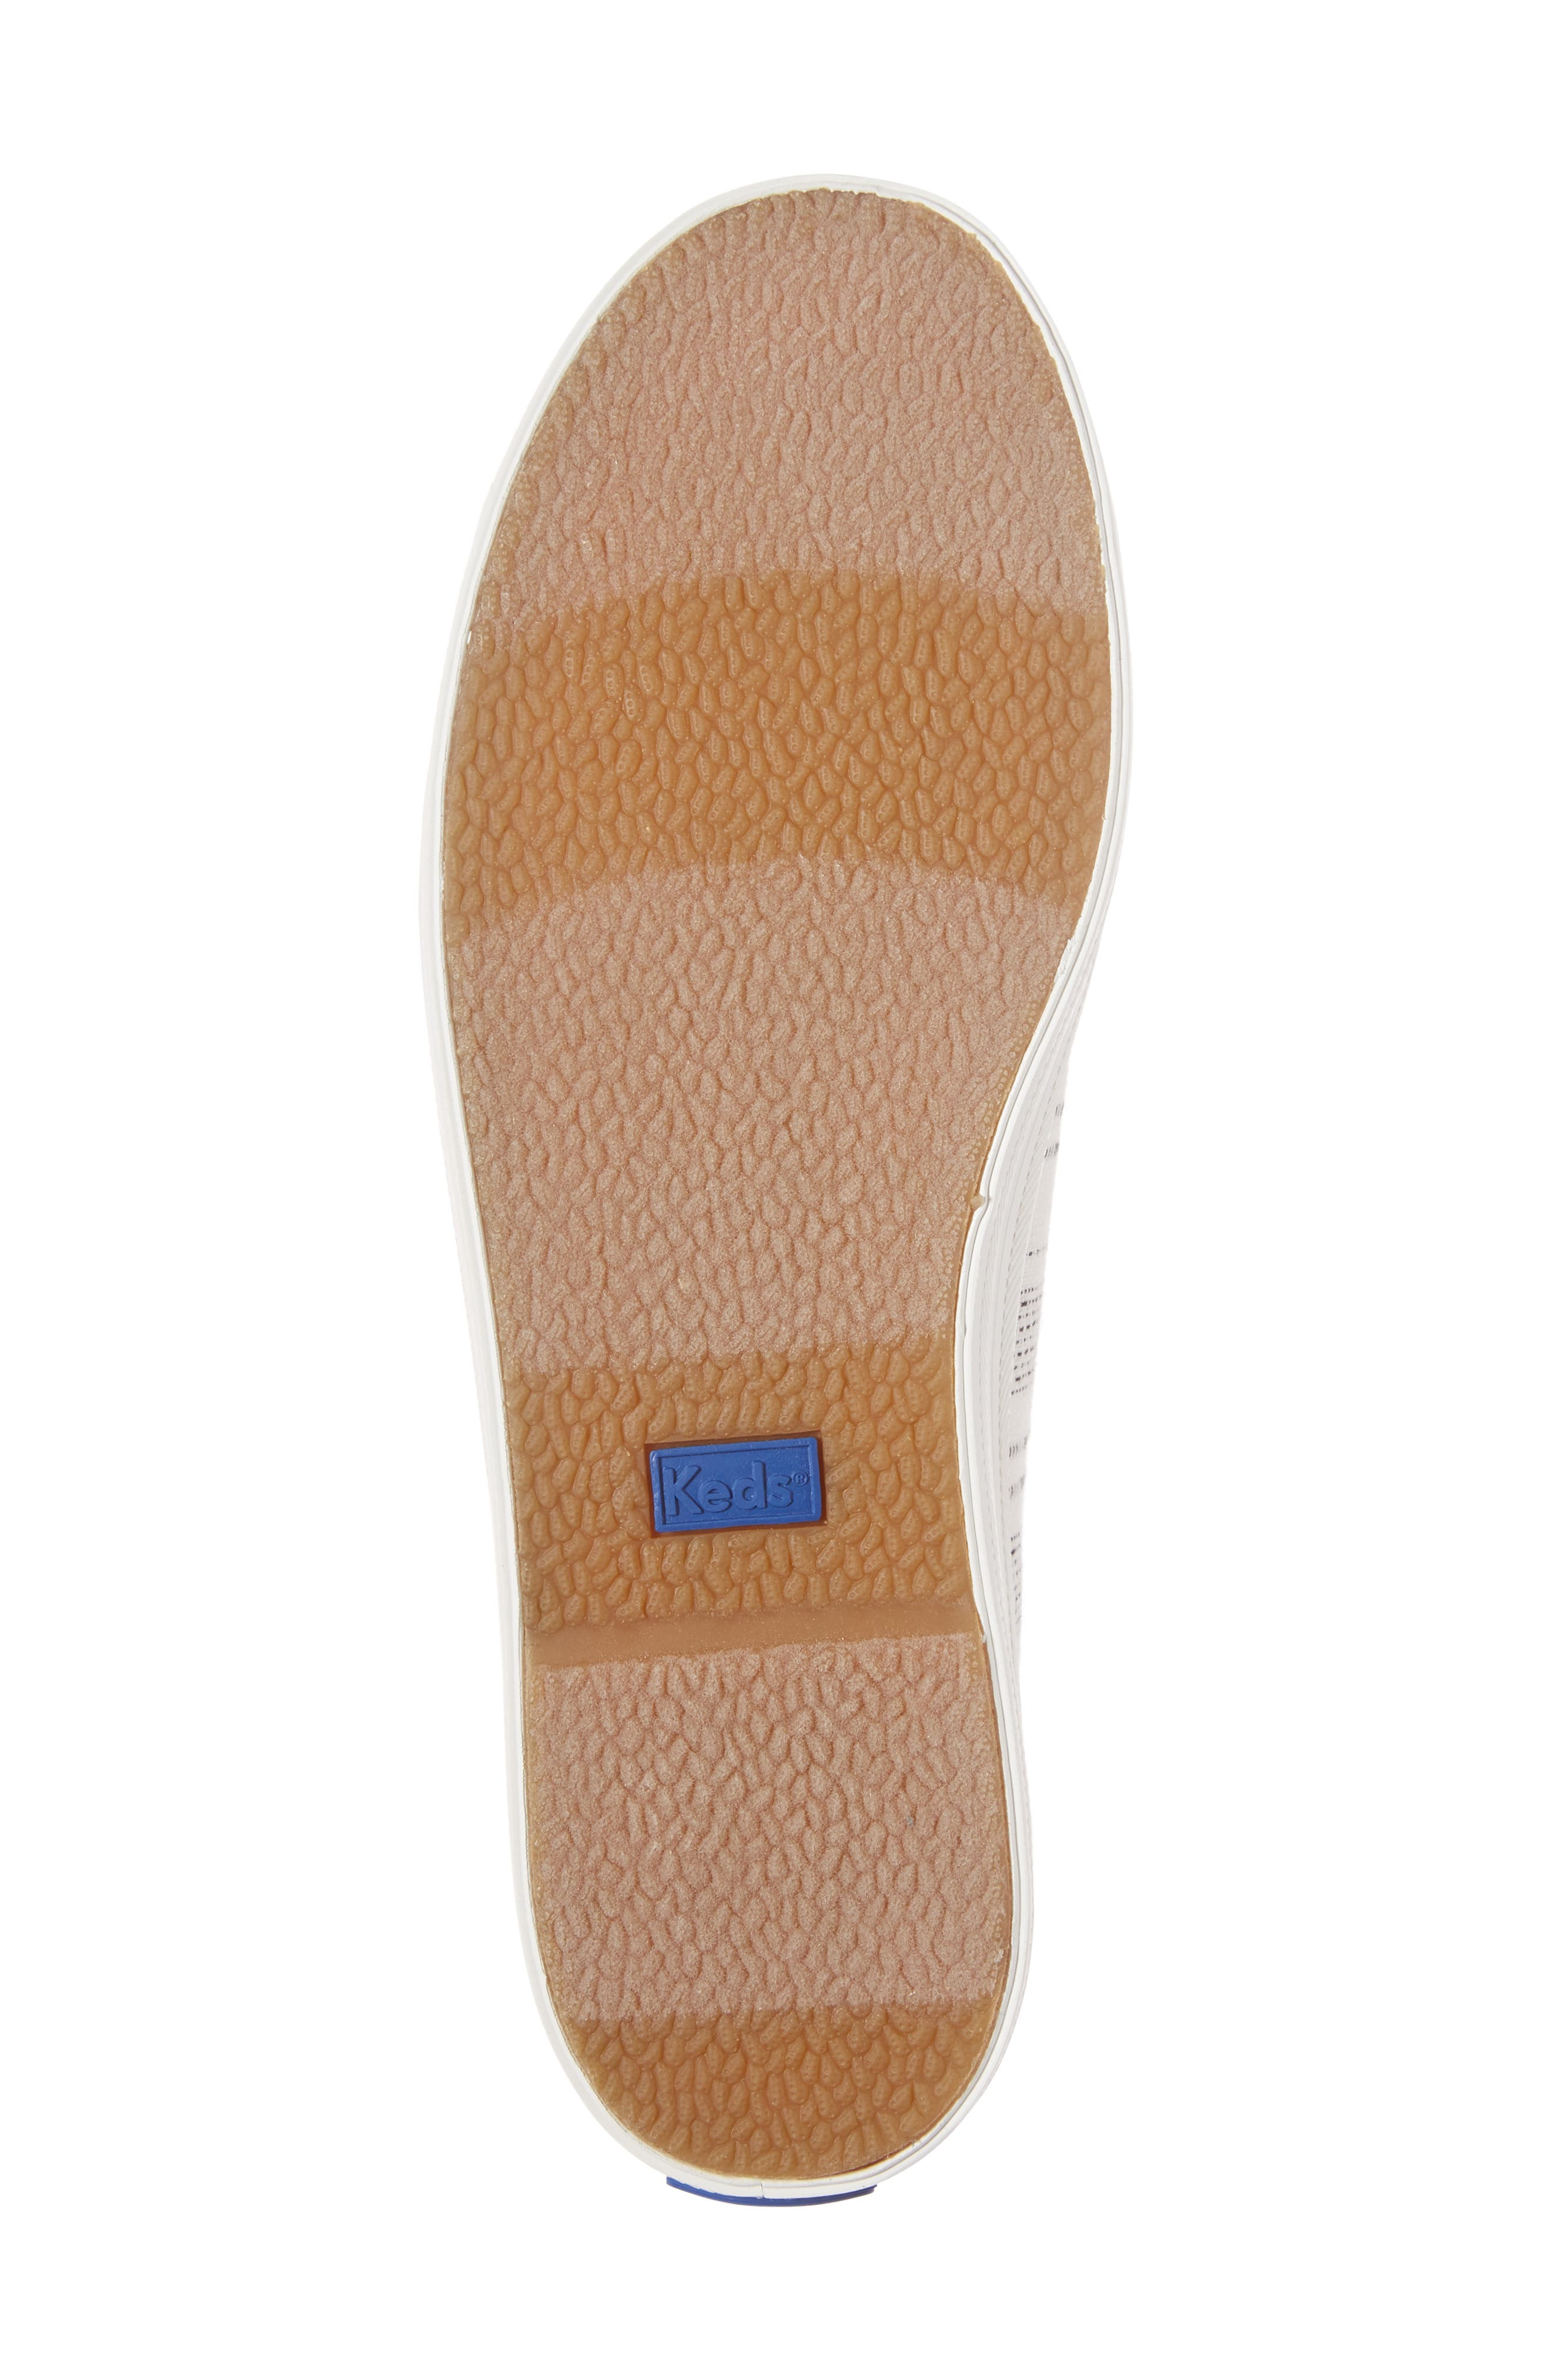 Kickstart Baja Stripe Sneaker,                             Alternate thumbnail 6, color,                             Cream